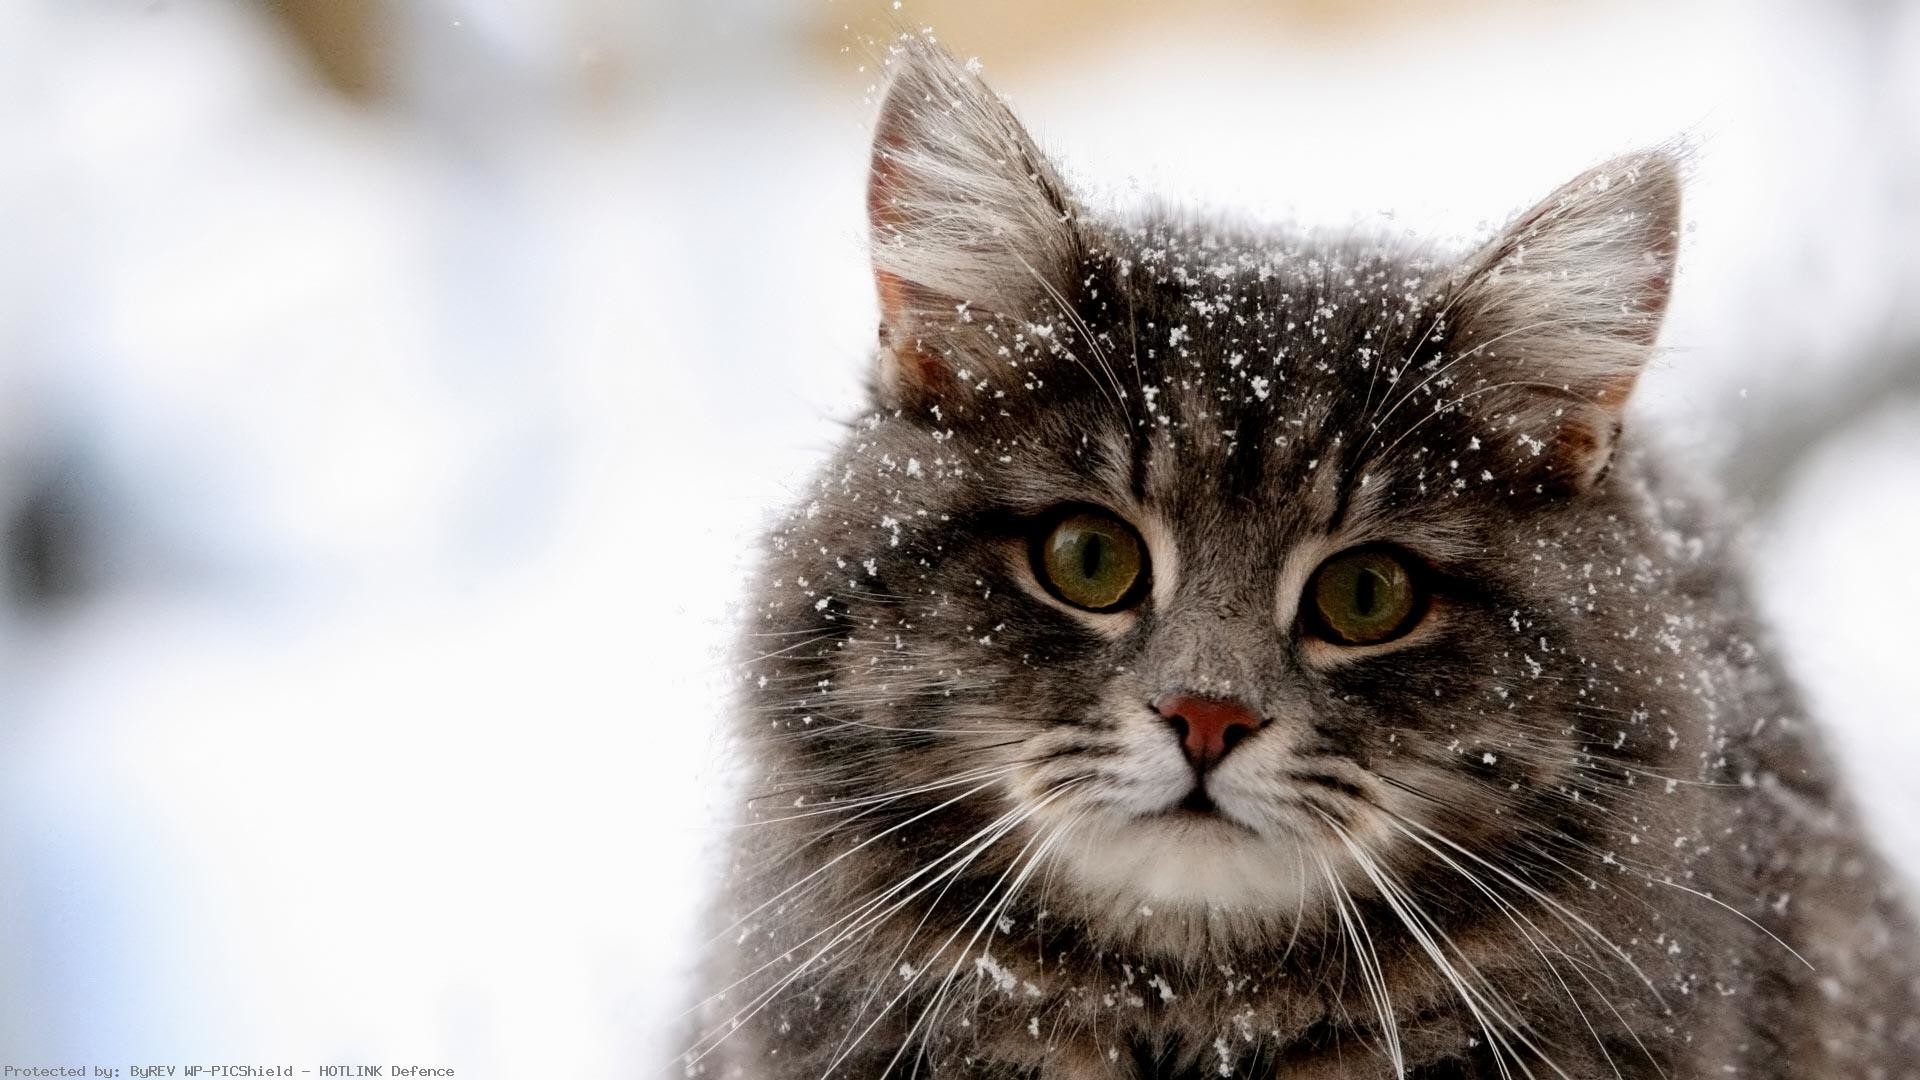 Winter-Animal-Desktop-wallpaper-wp60014060